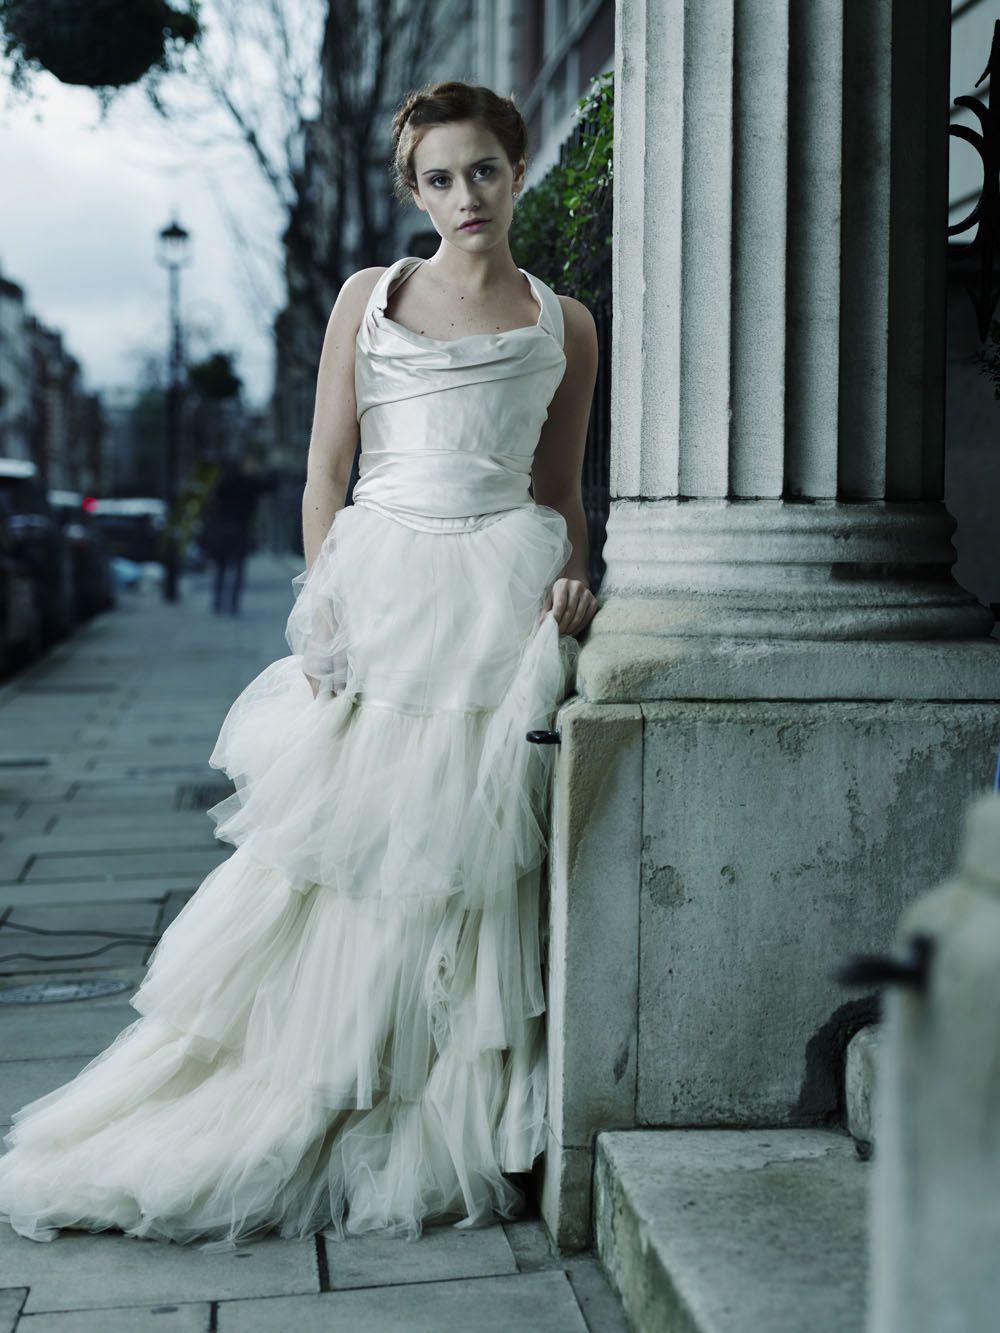 Moody bride, gothic wedding inspiration REVELRY EVENTS - WEDDING ...